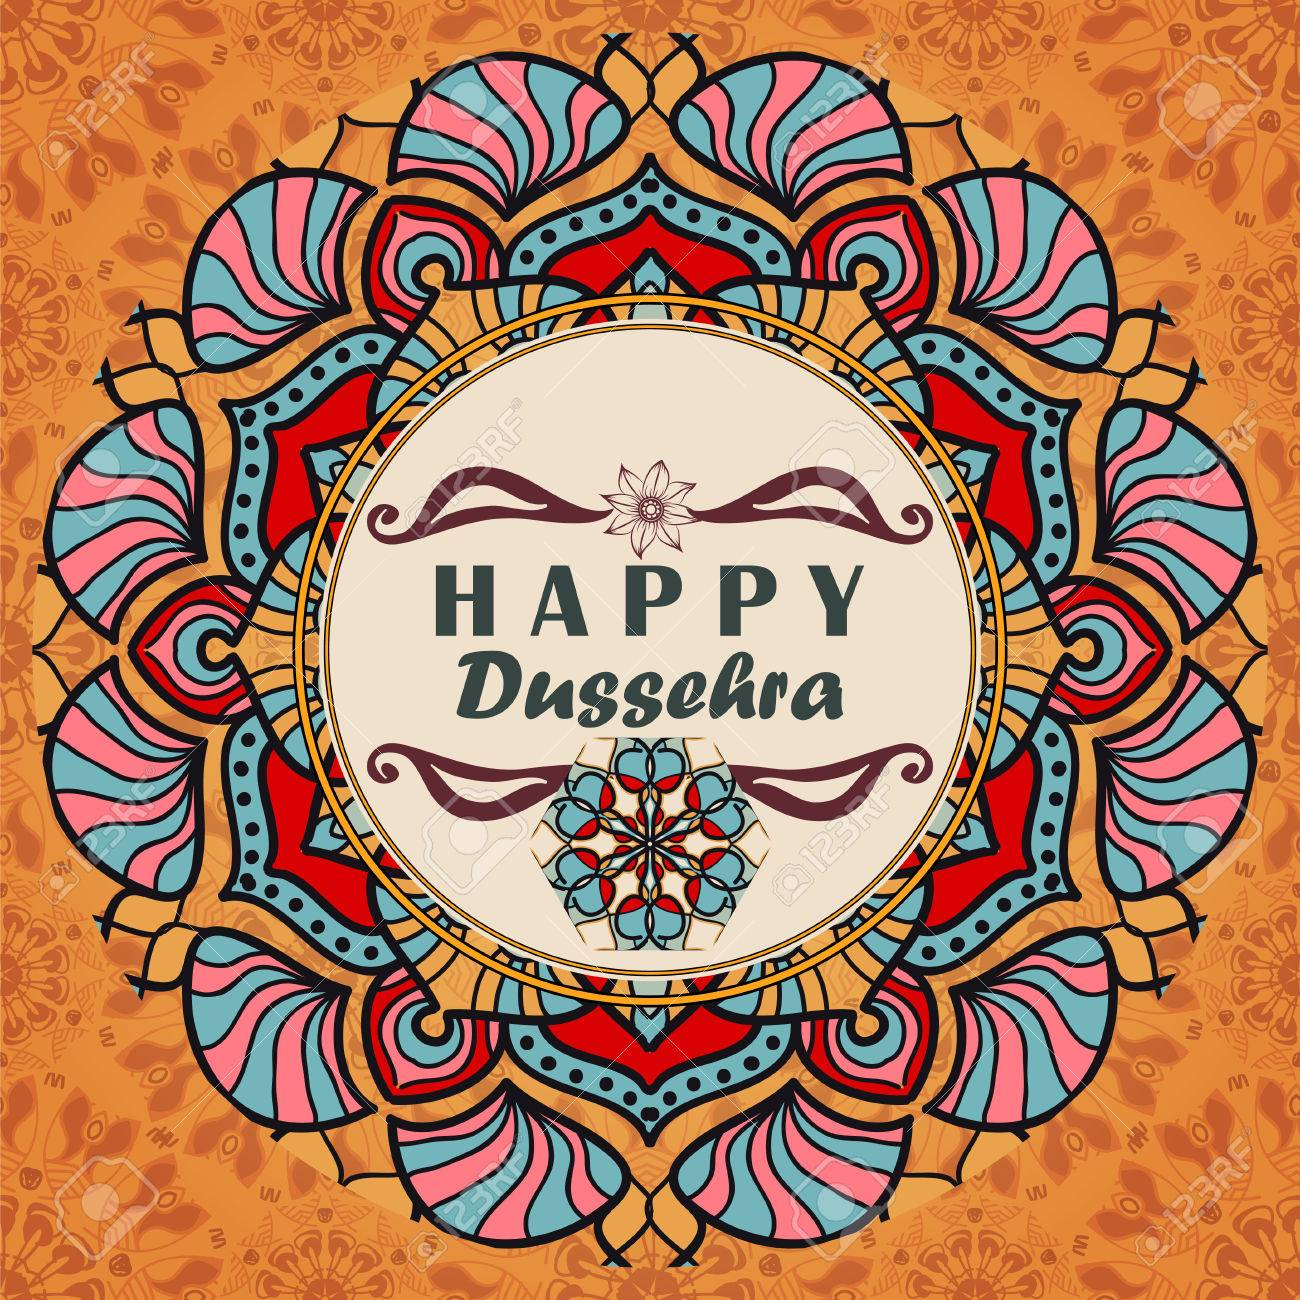 Greeting Card To Indian Festival Vijayadashami Happy Dussehra